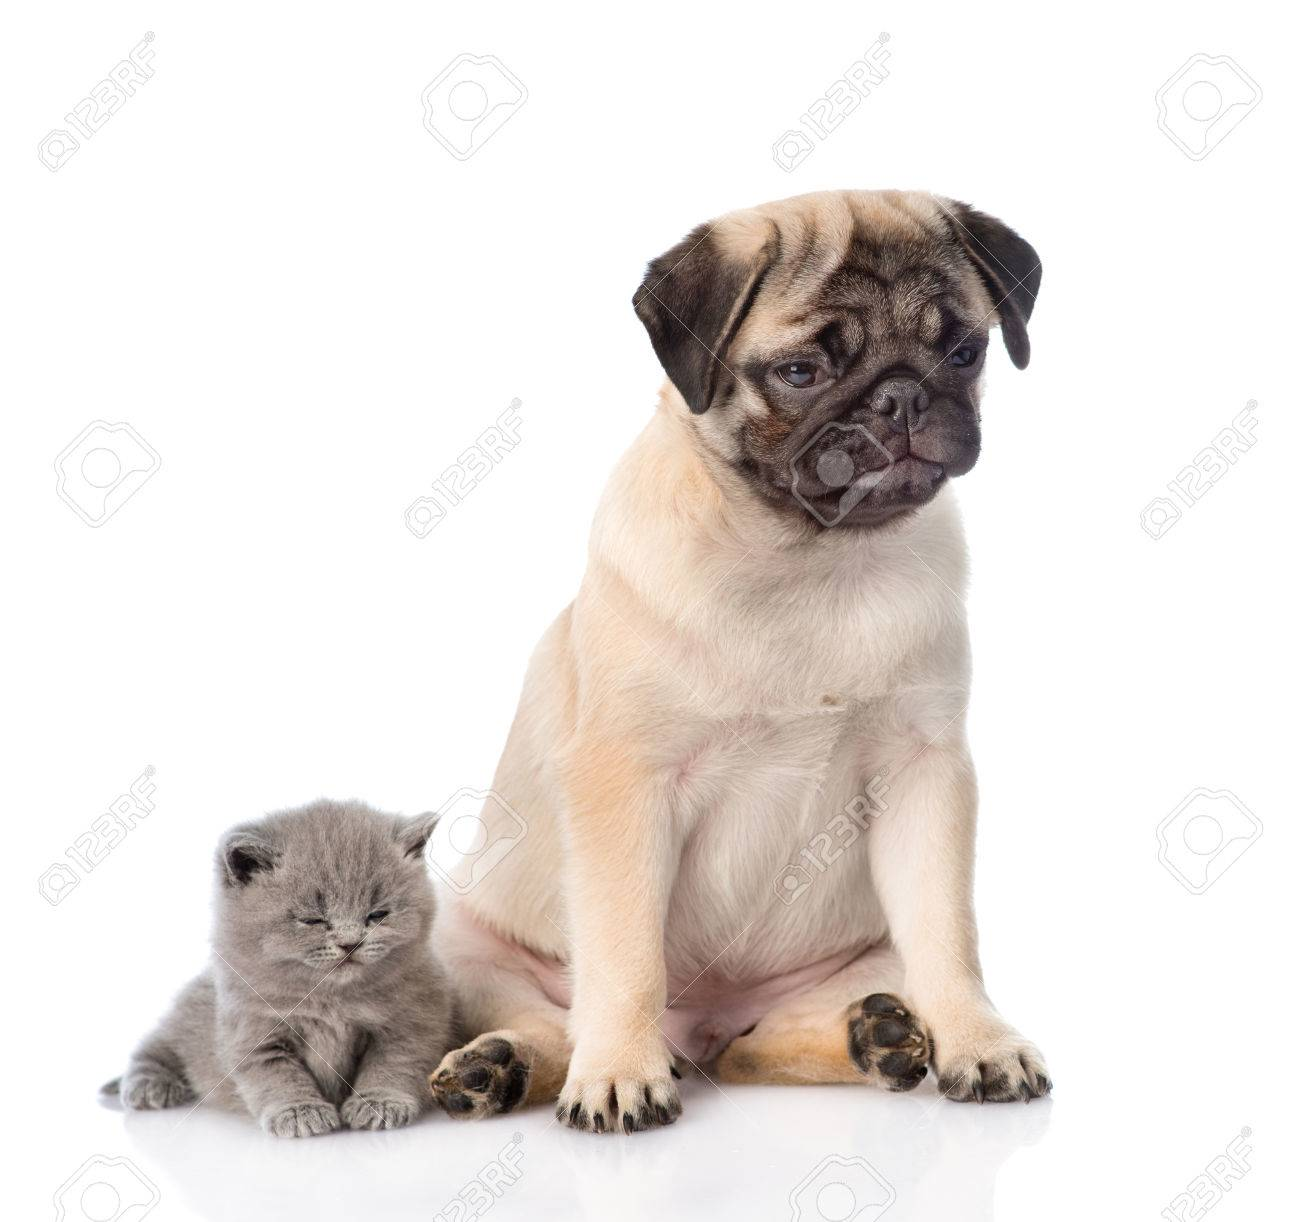 Sad Pug Puppy With Sleeping Scottish Kitten Isolated On White